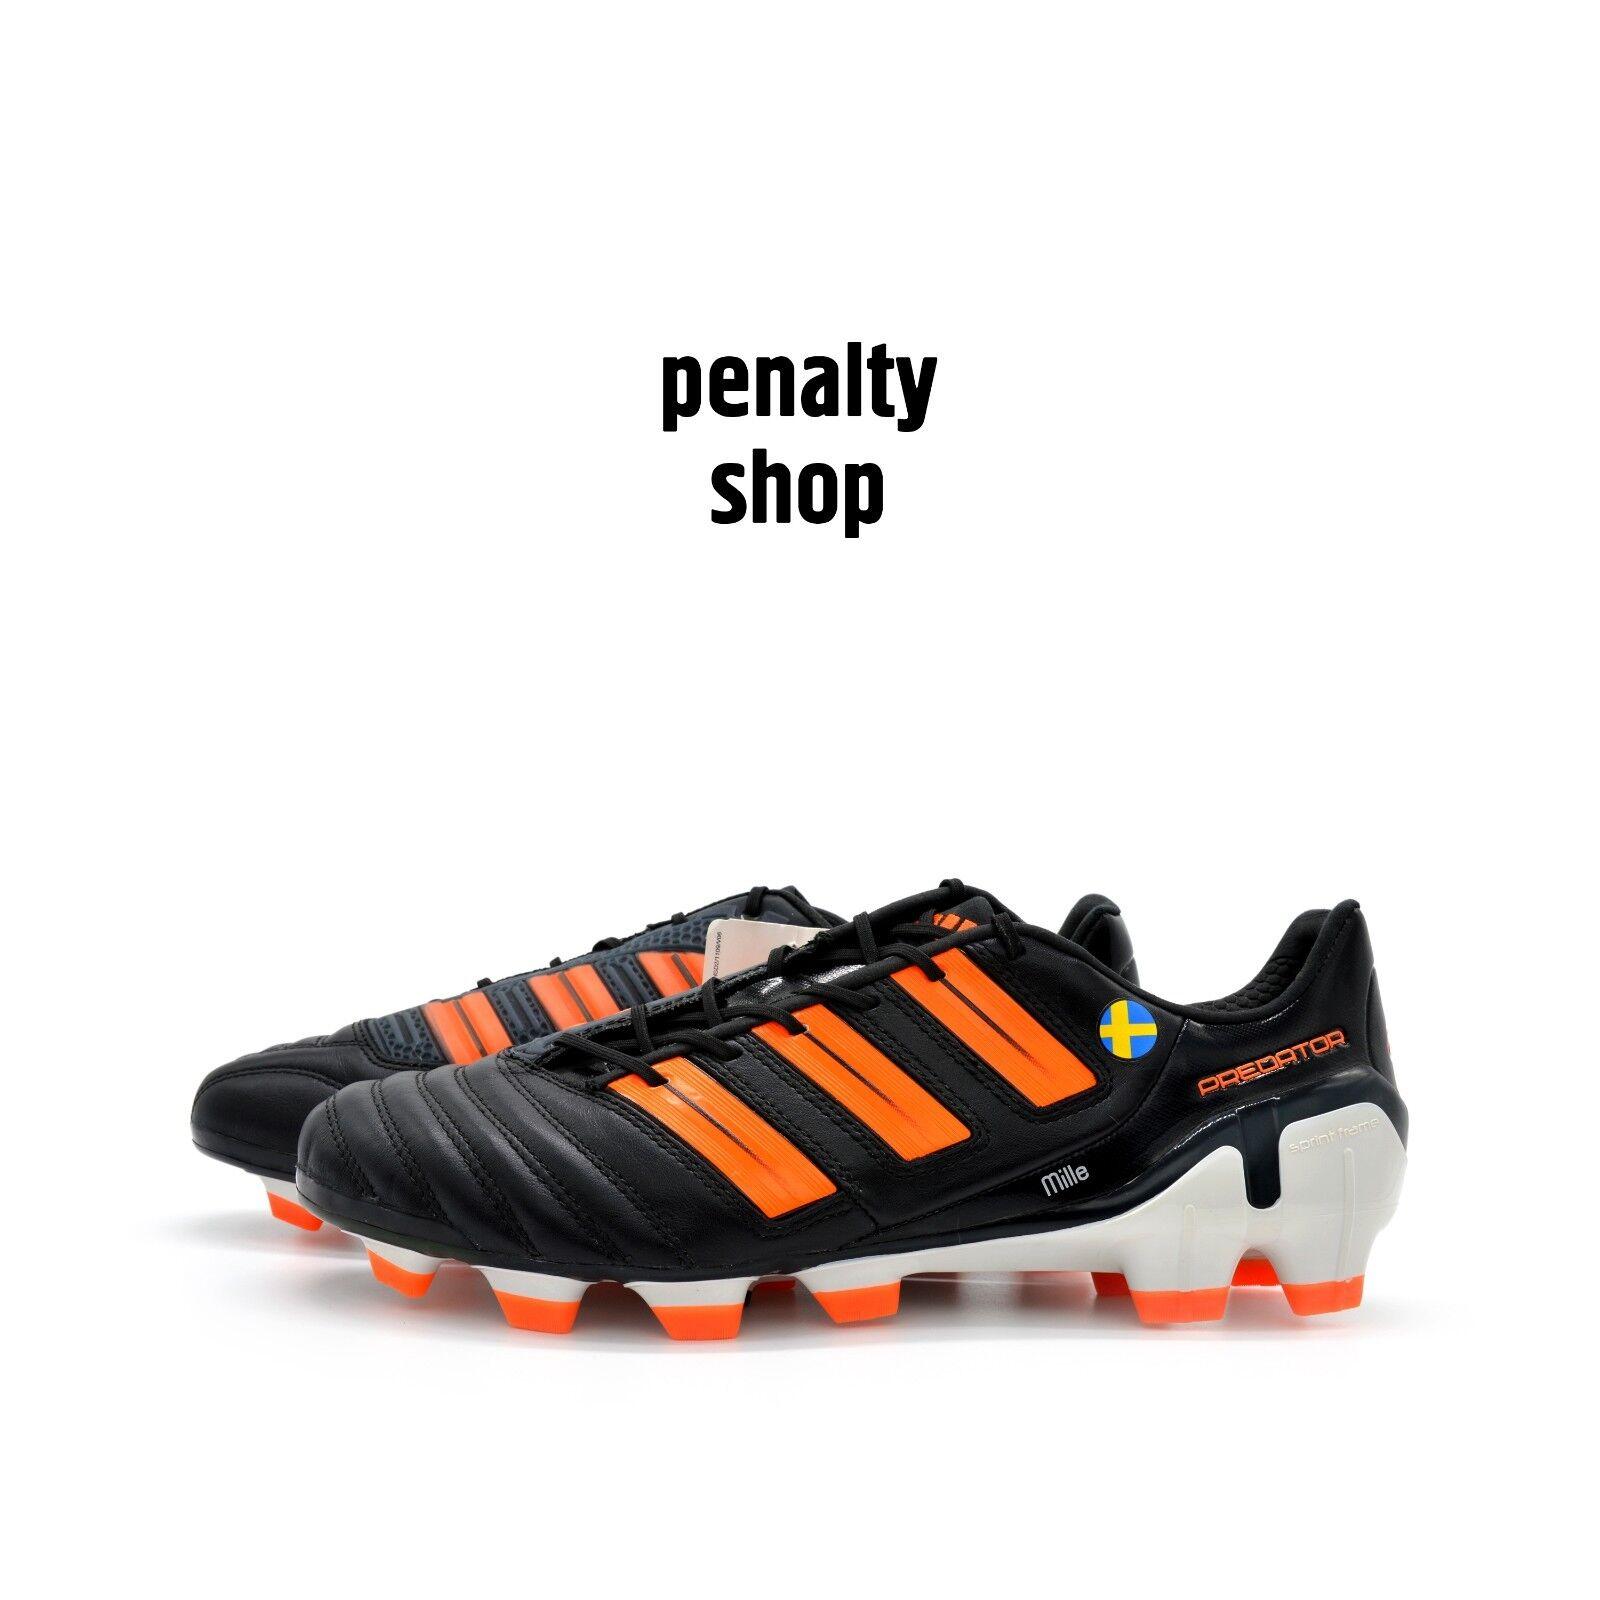 Adidas adipower Protator TRX FG V23524 Pontus Wernbloom Match Worn Stiefel RARE